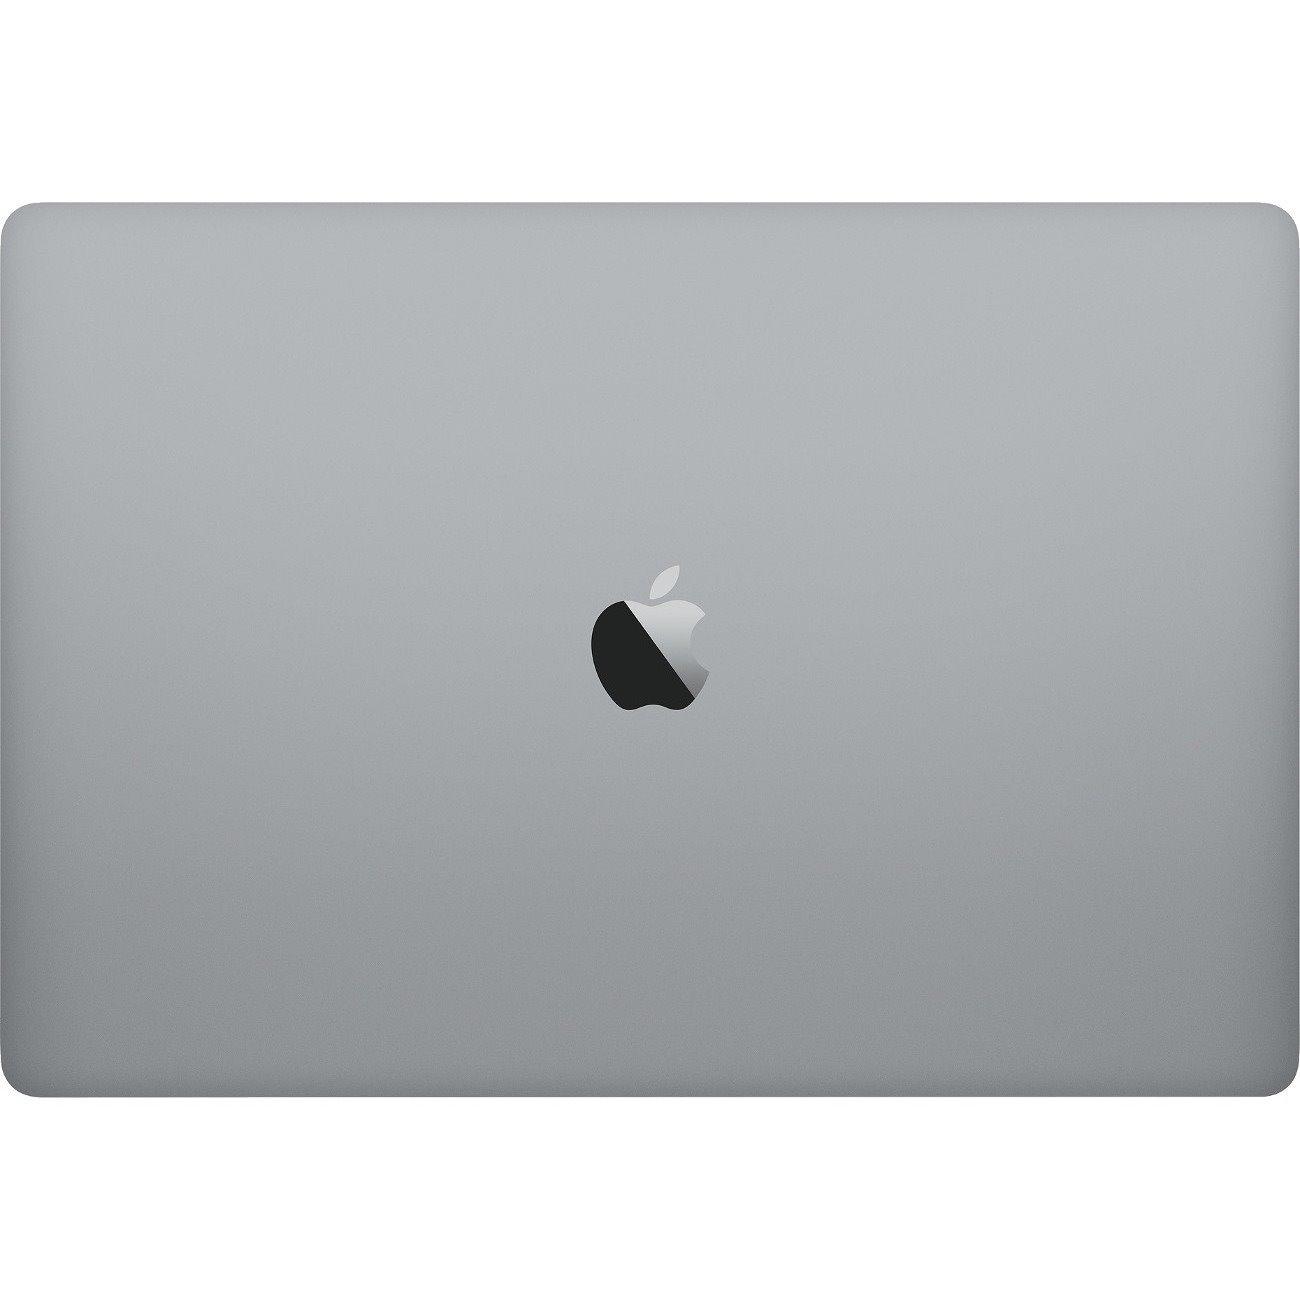 "Apple MacBook Pro MR932X/A 39.1 cm (15.4"") LCD Notebook - Intel Core i7 (8th Gen) Hexa-core (6 Core) 2.20 GHz - 16 GB DDR4 SDRAM - 256 GB SSD - Mac OS High Sierra - 2880 x 1800 - Retina Display, In-plane Switching (IPS) Technology, True Tone technology - Space Gray"